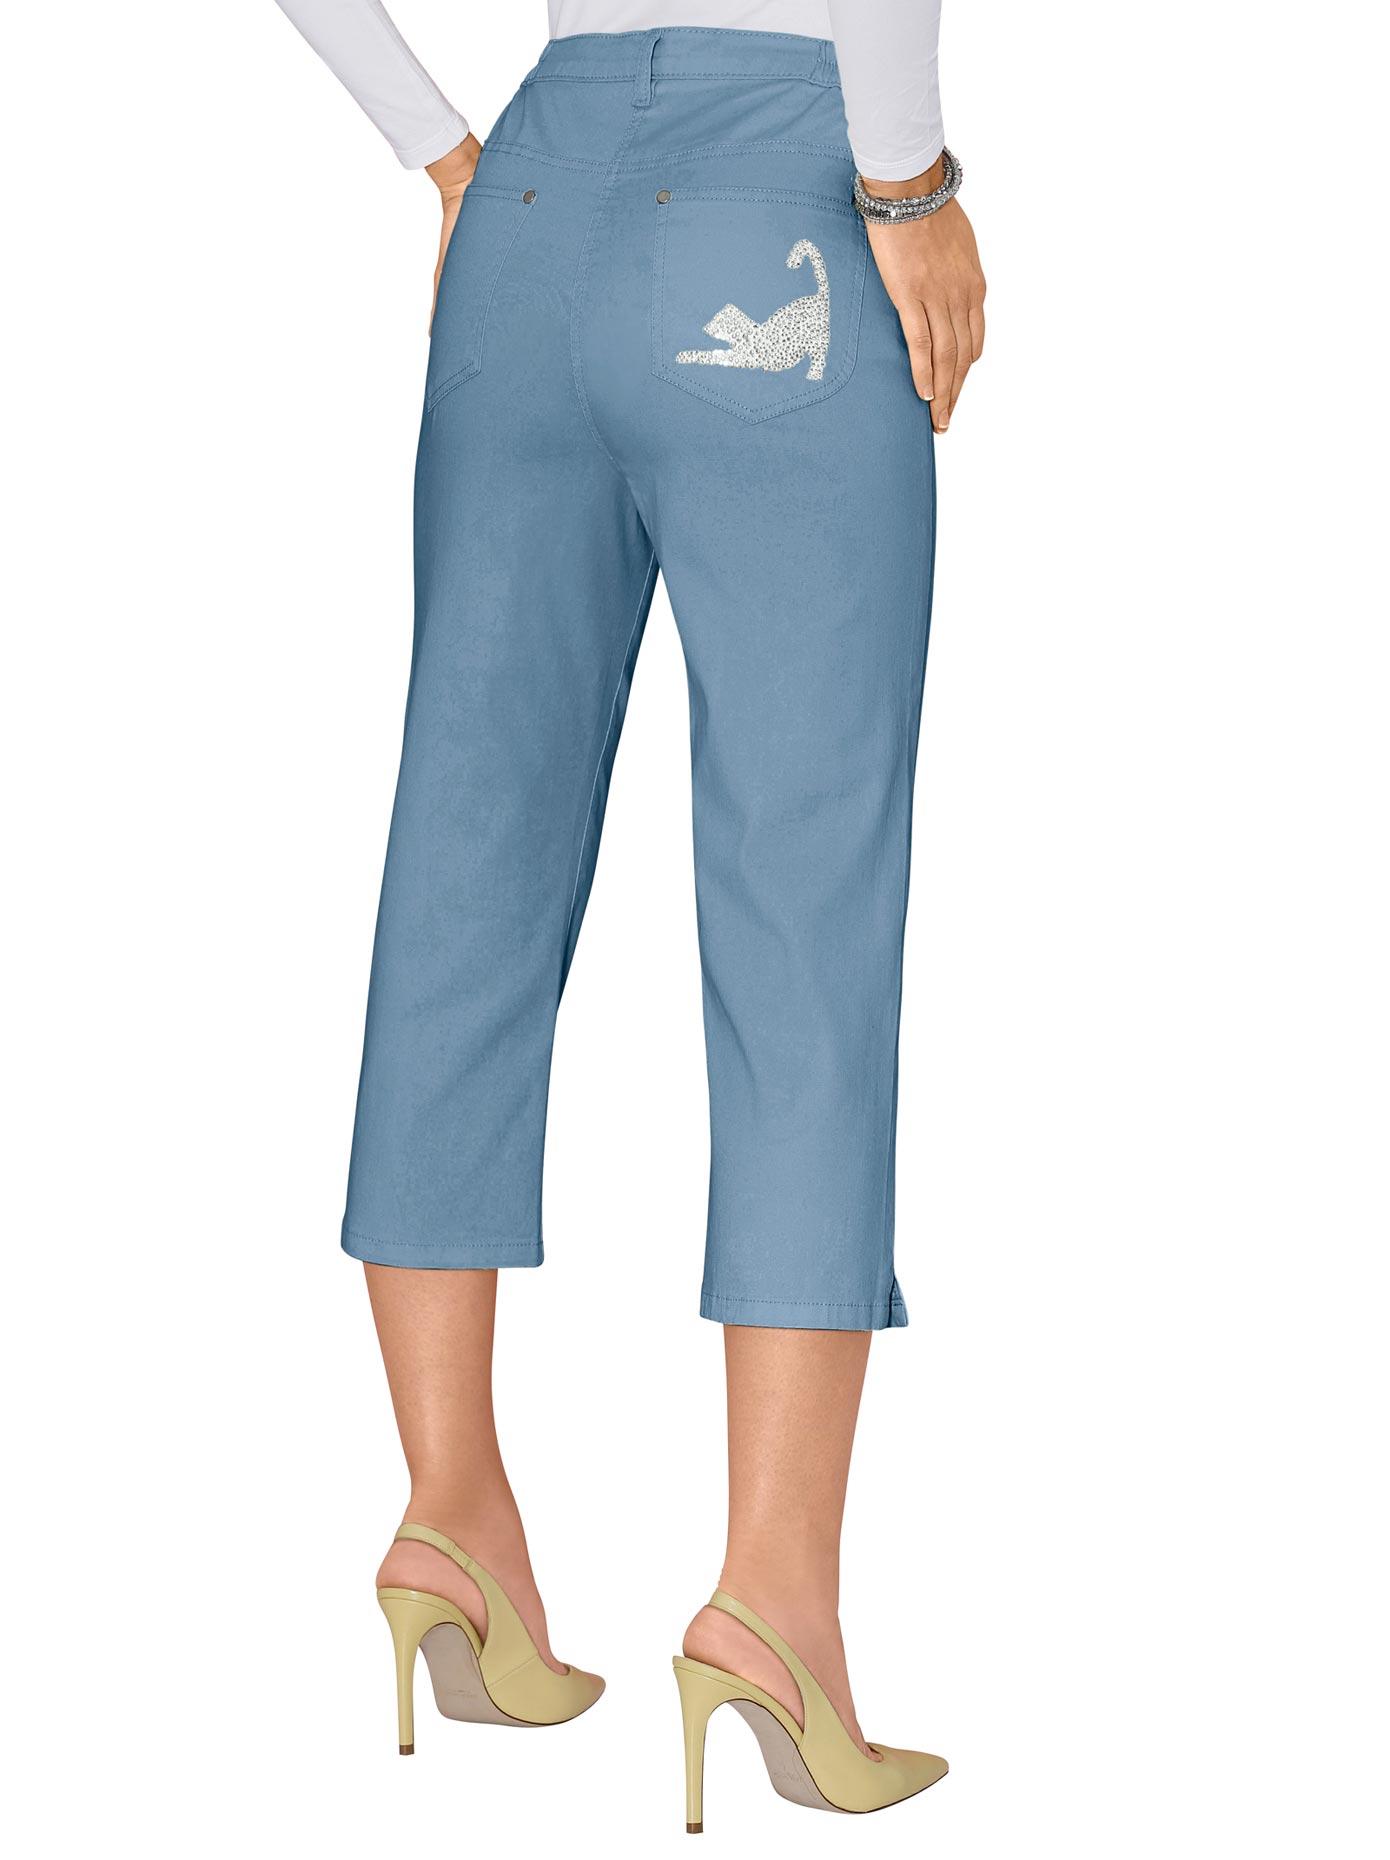 Classic Basics Capri-Jeans mit seitlichem Dehnbund | Bekleidung > Jeans > Caprijeans | Classic Basics